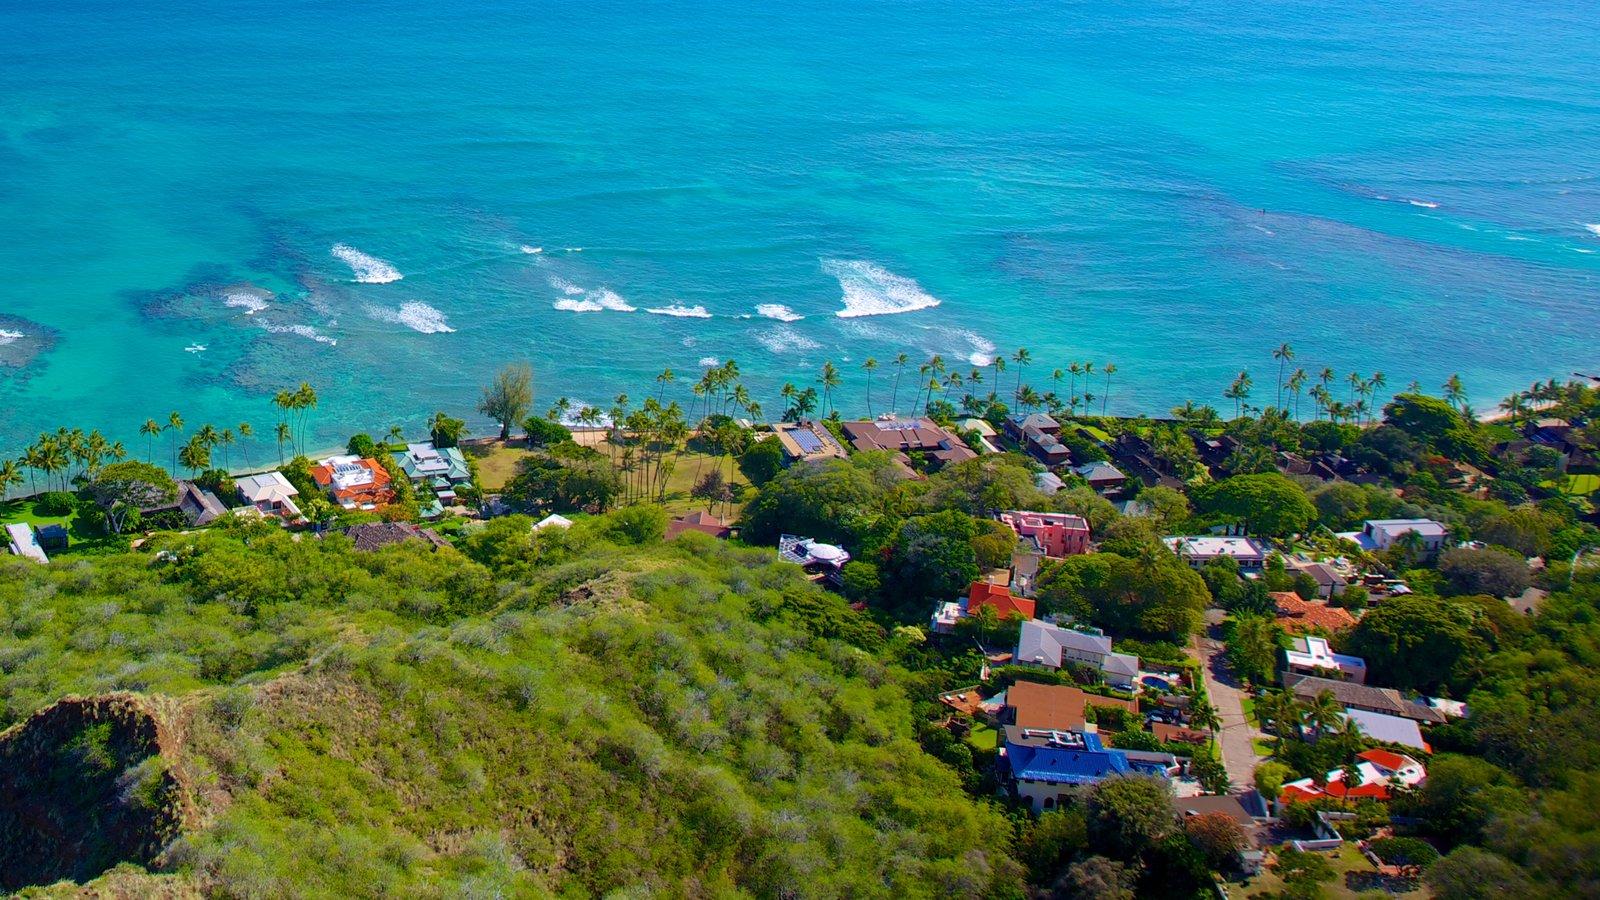 Diamond Head featuring general coastal views and a coastal town